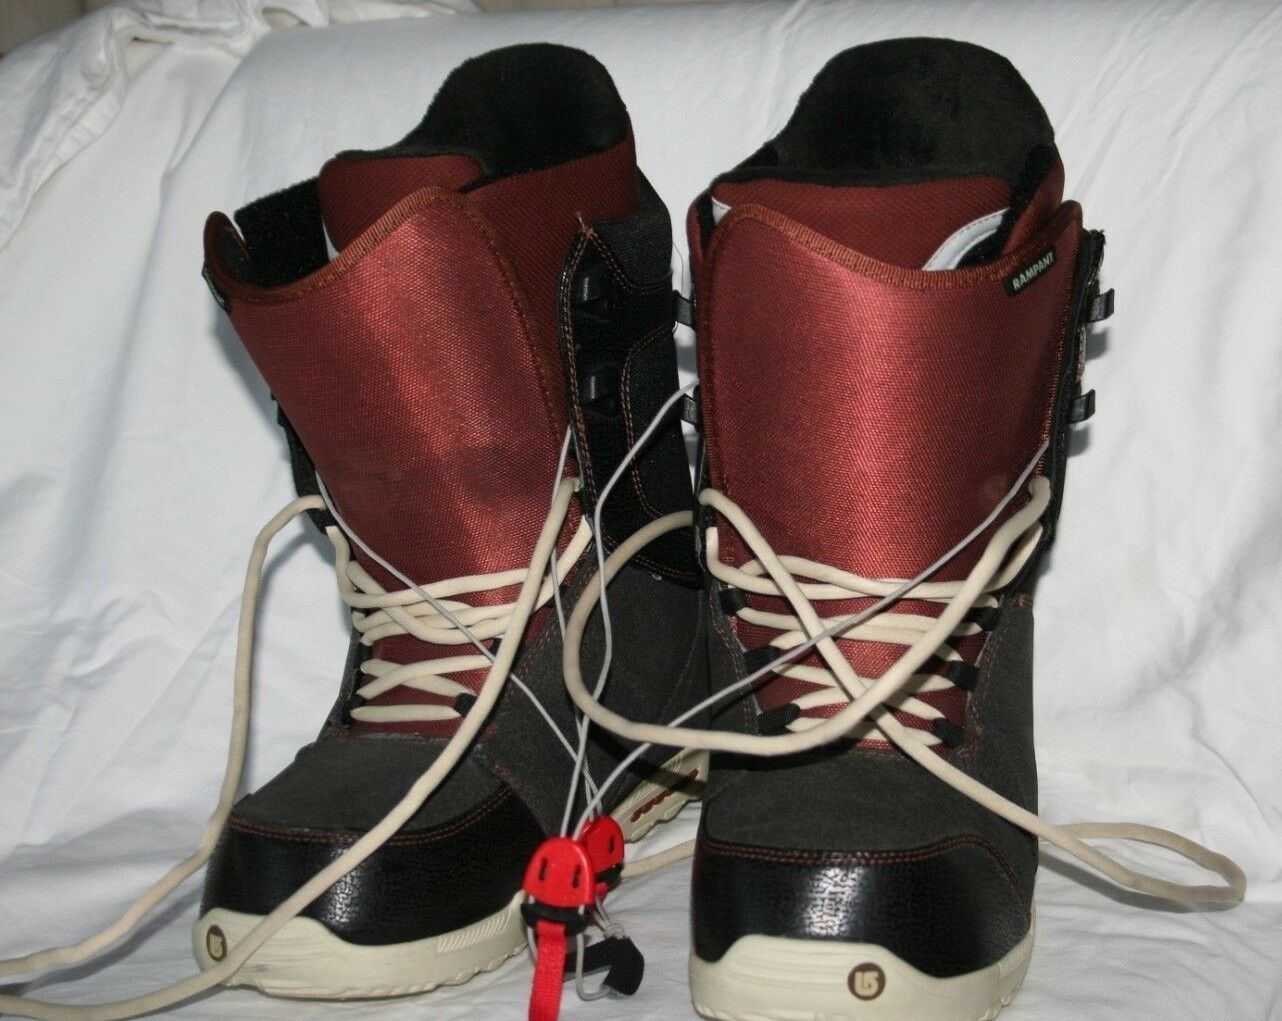 Burton RAMPANT Snowboard Boot -  Men's SIZE 12  limited edition